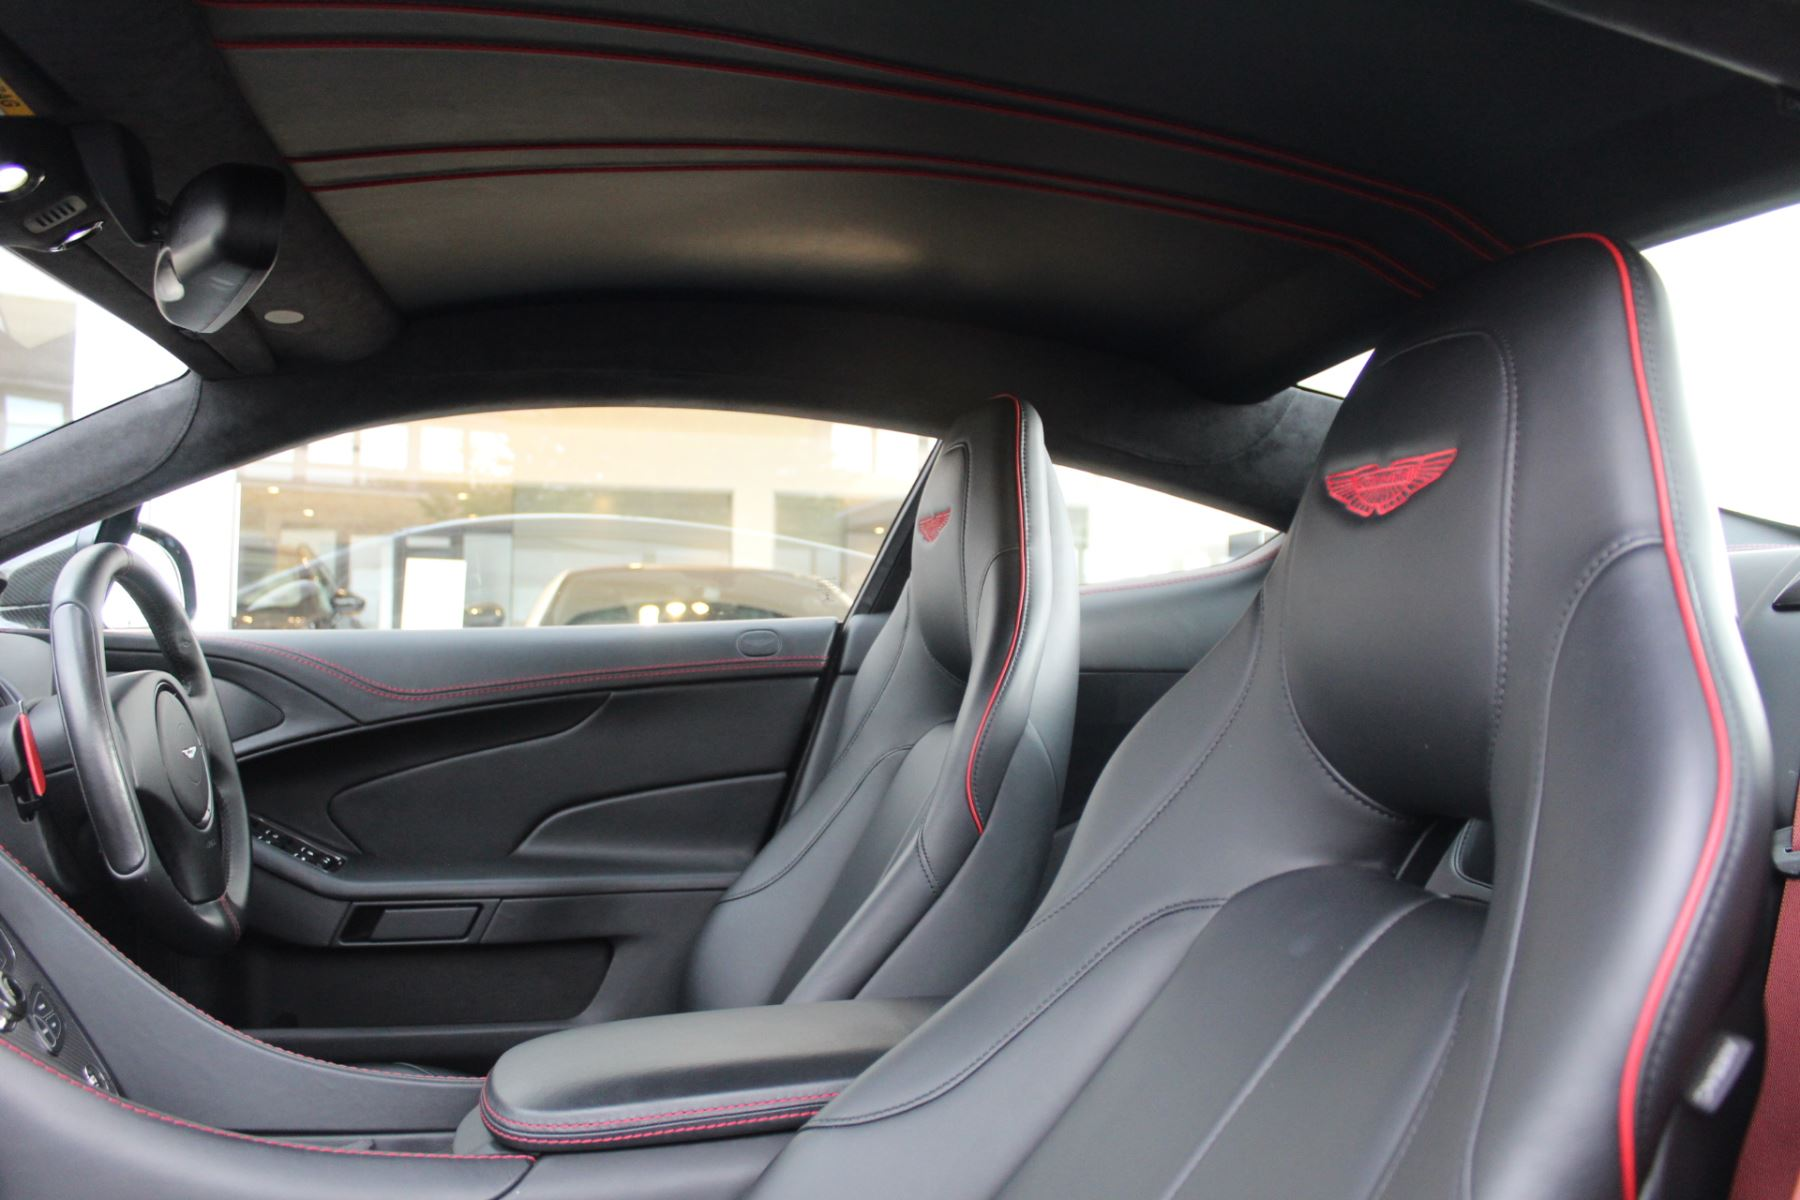 Aston Martin Vanquish V12 [568] 2+2 2dr Touchtronic  Carbon Black Edition  image 6